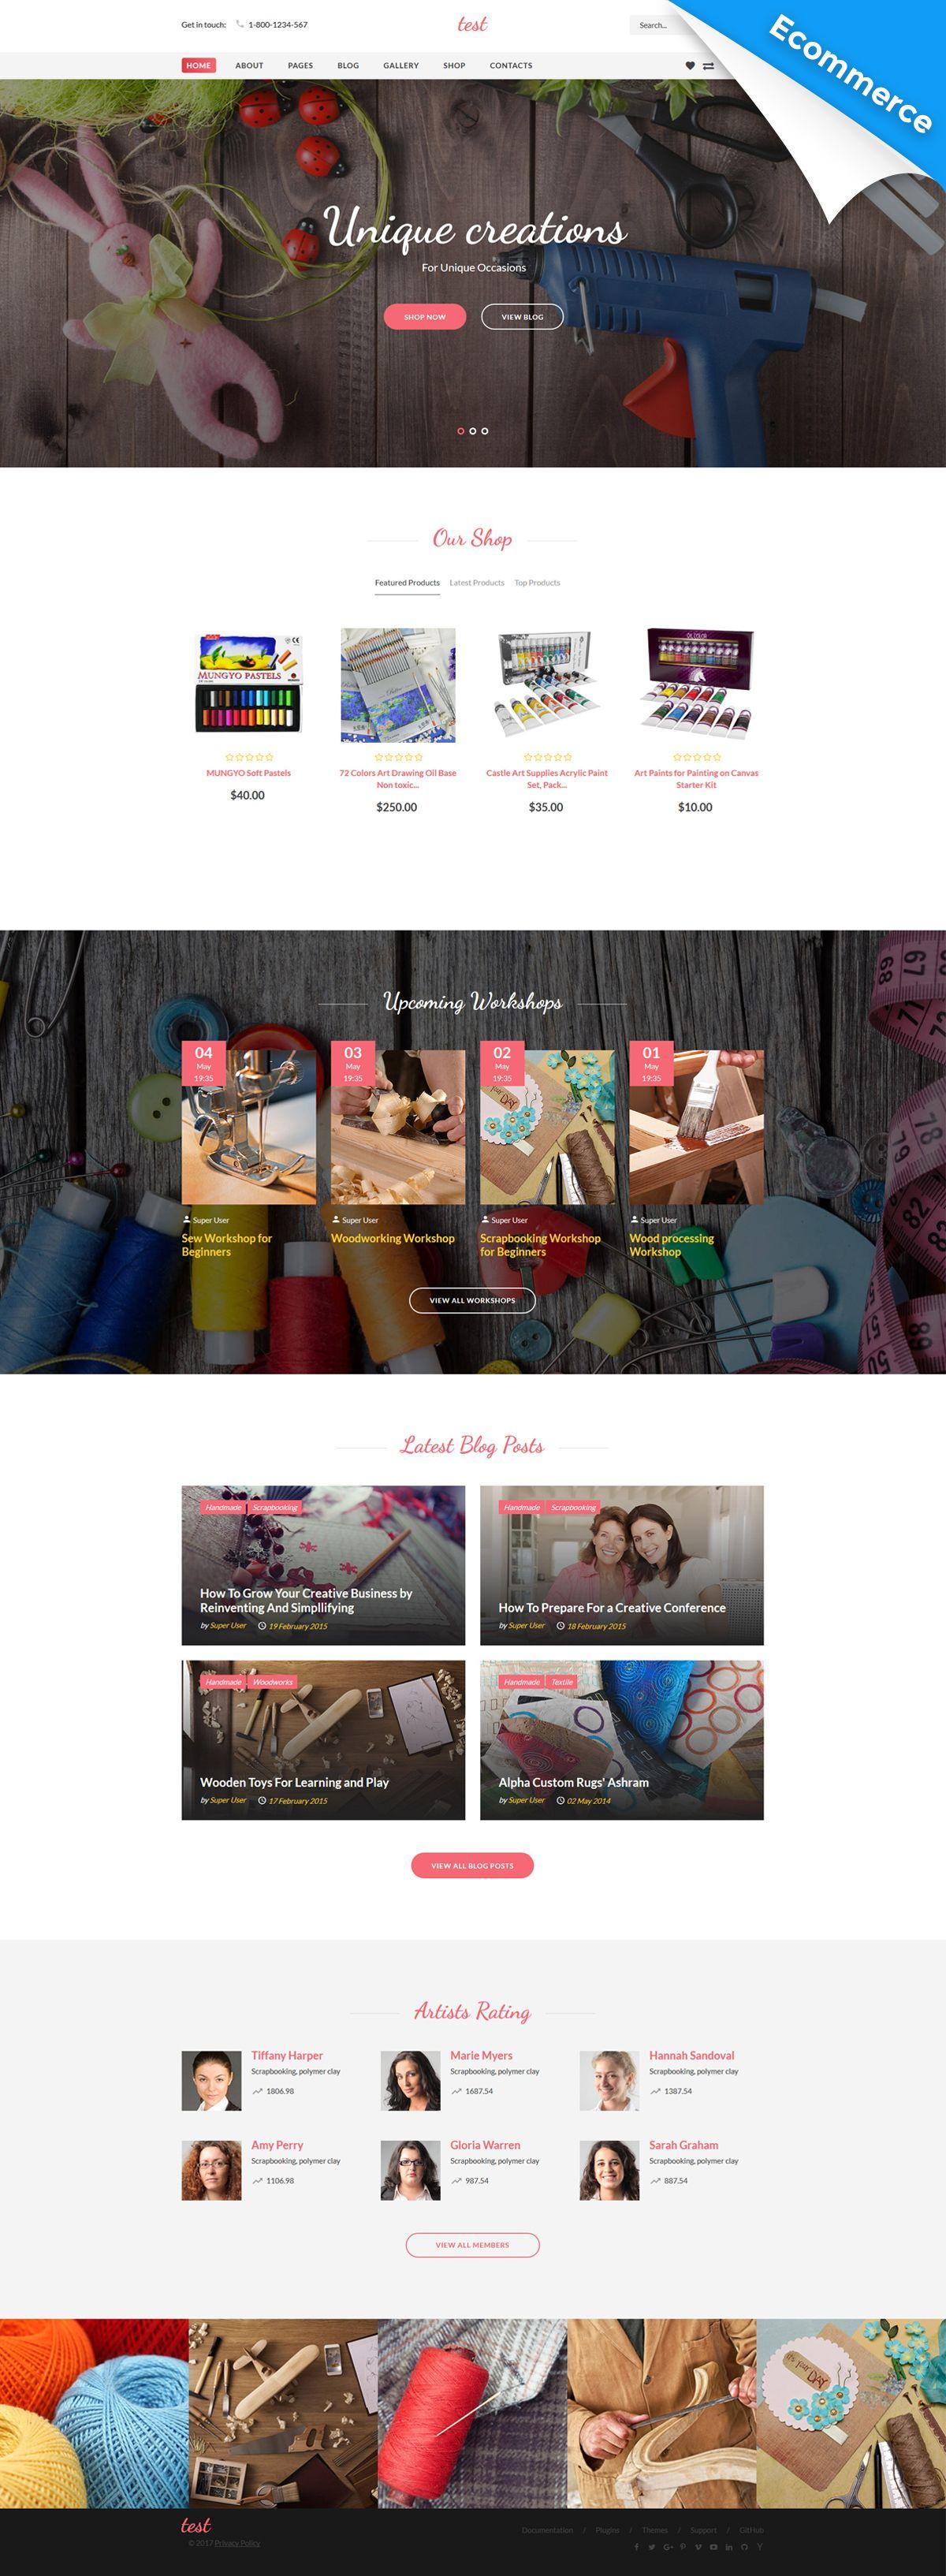 Creative Joomla VirtueMart eCommerce Template - https://www.templatemonster.com/joomla-templates/handmade-creative-shop-virtuemart-joomla-template-61138.html